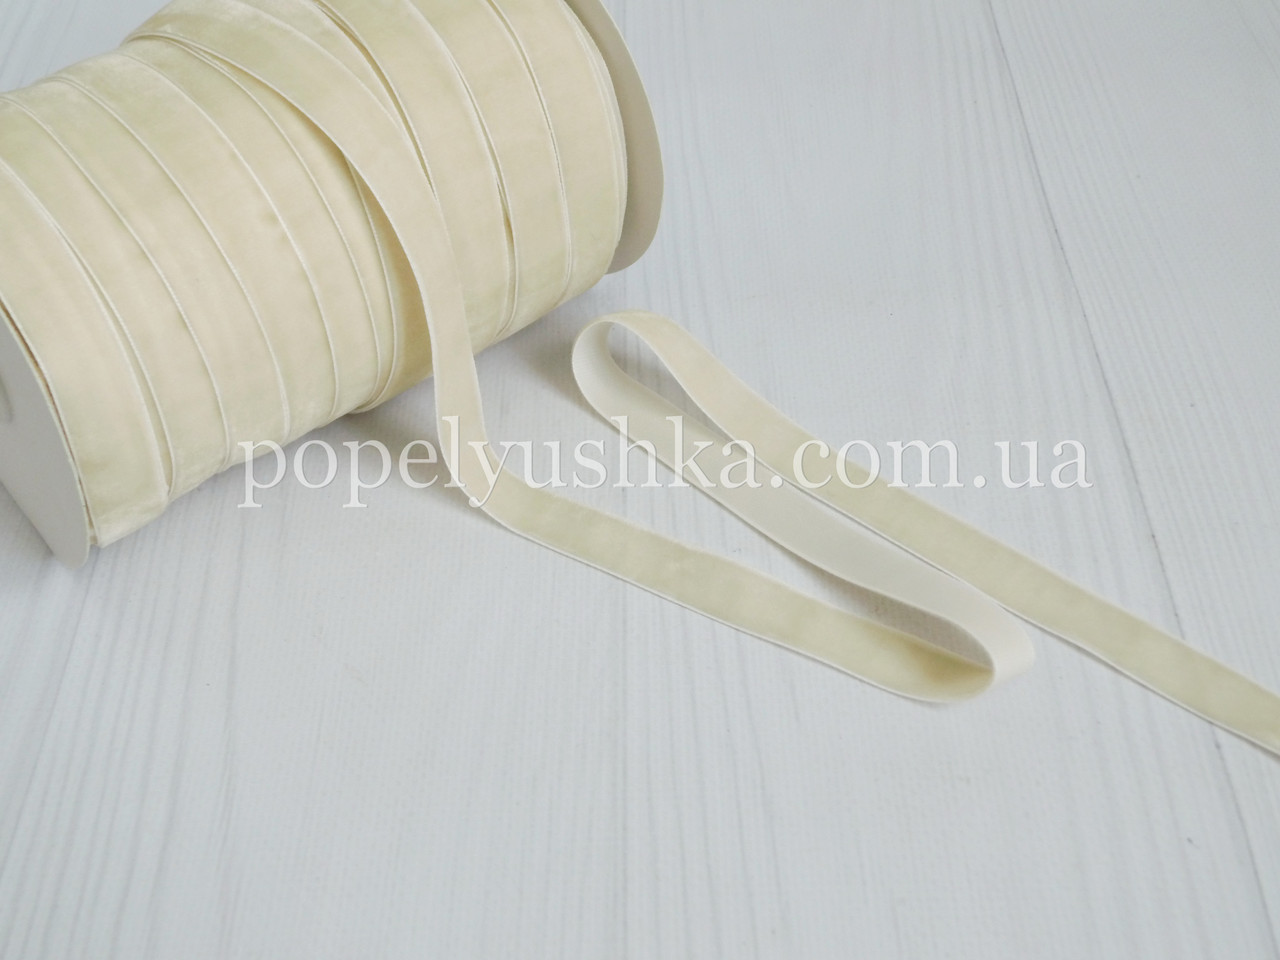 Стрічка оксамитова 1,5 см молочна